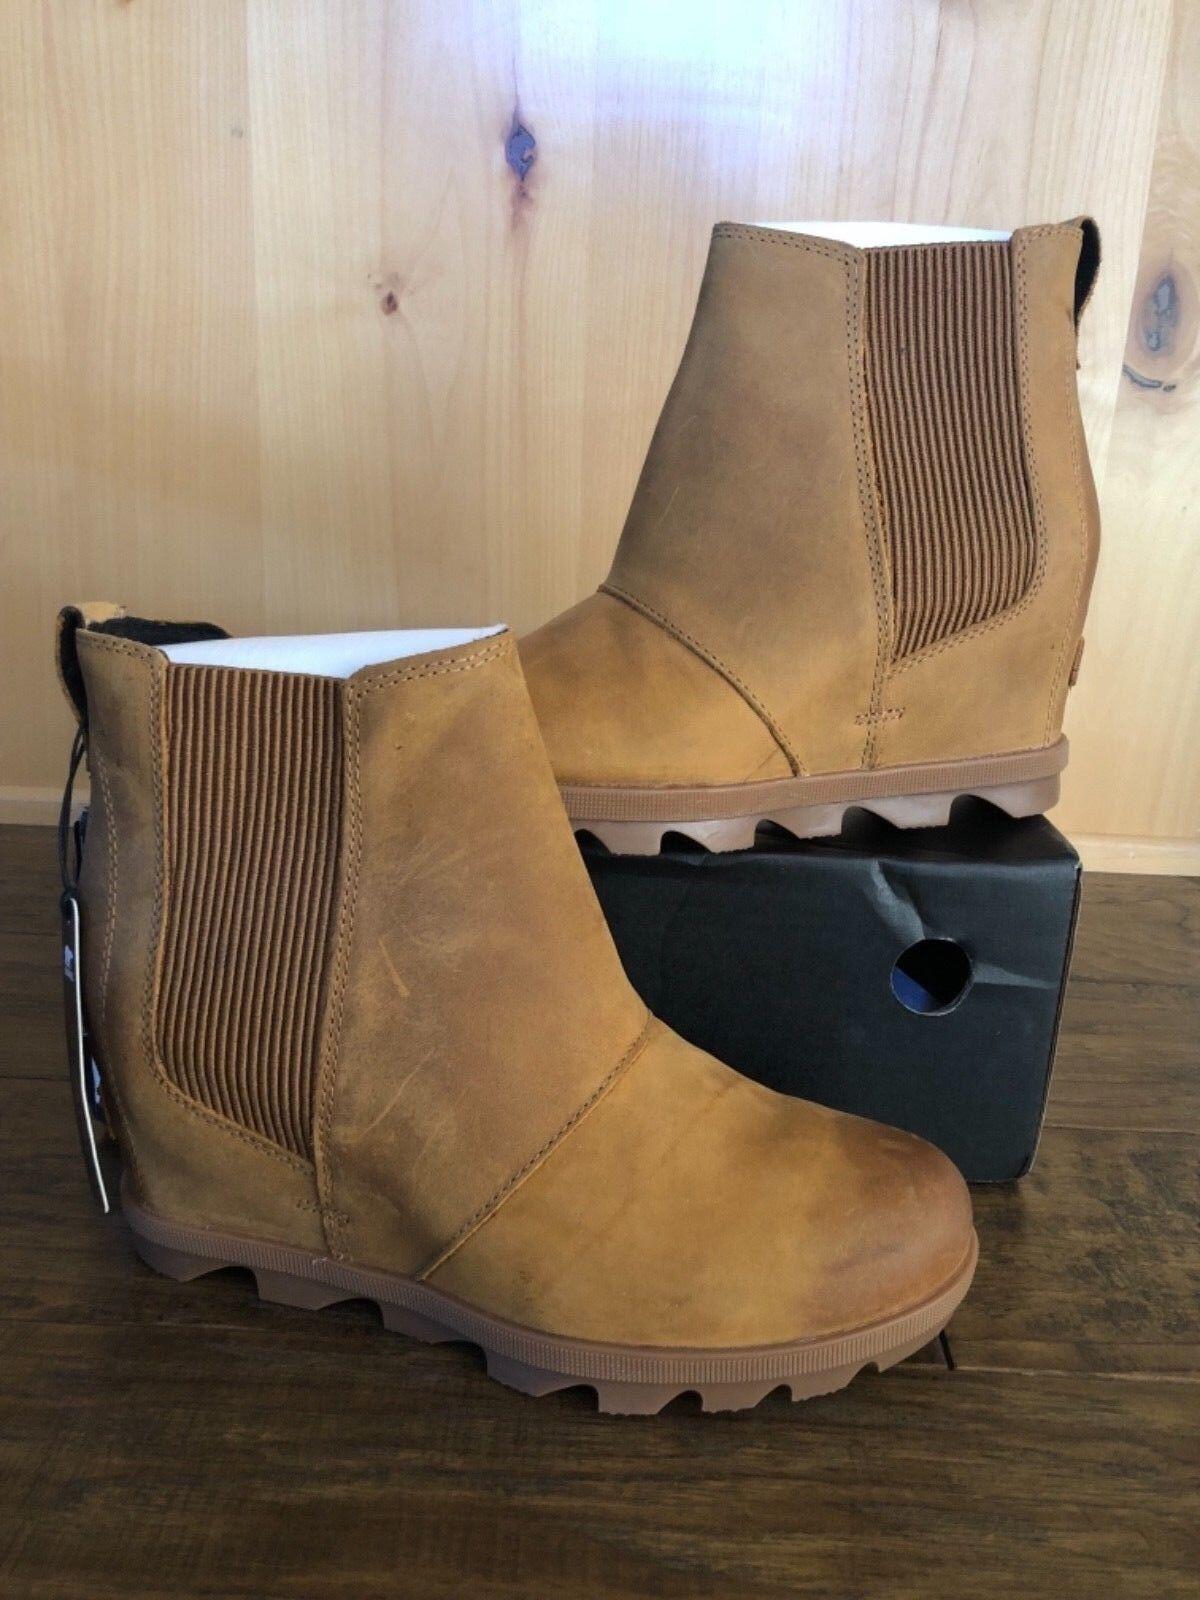 Sorel Joan Of Artic Chelsea wedge boots 8 Ex Lea Brand New in box Store Display